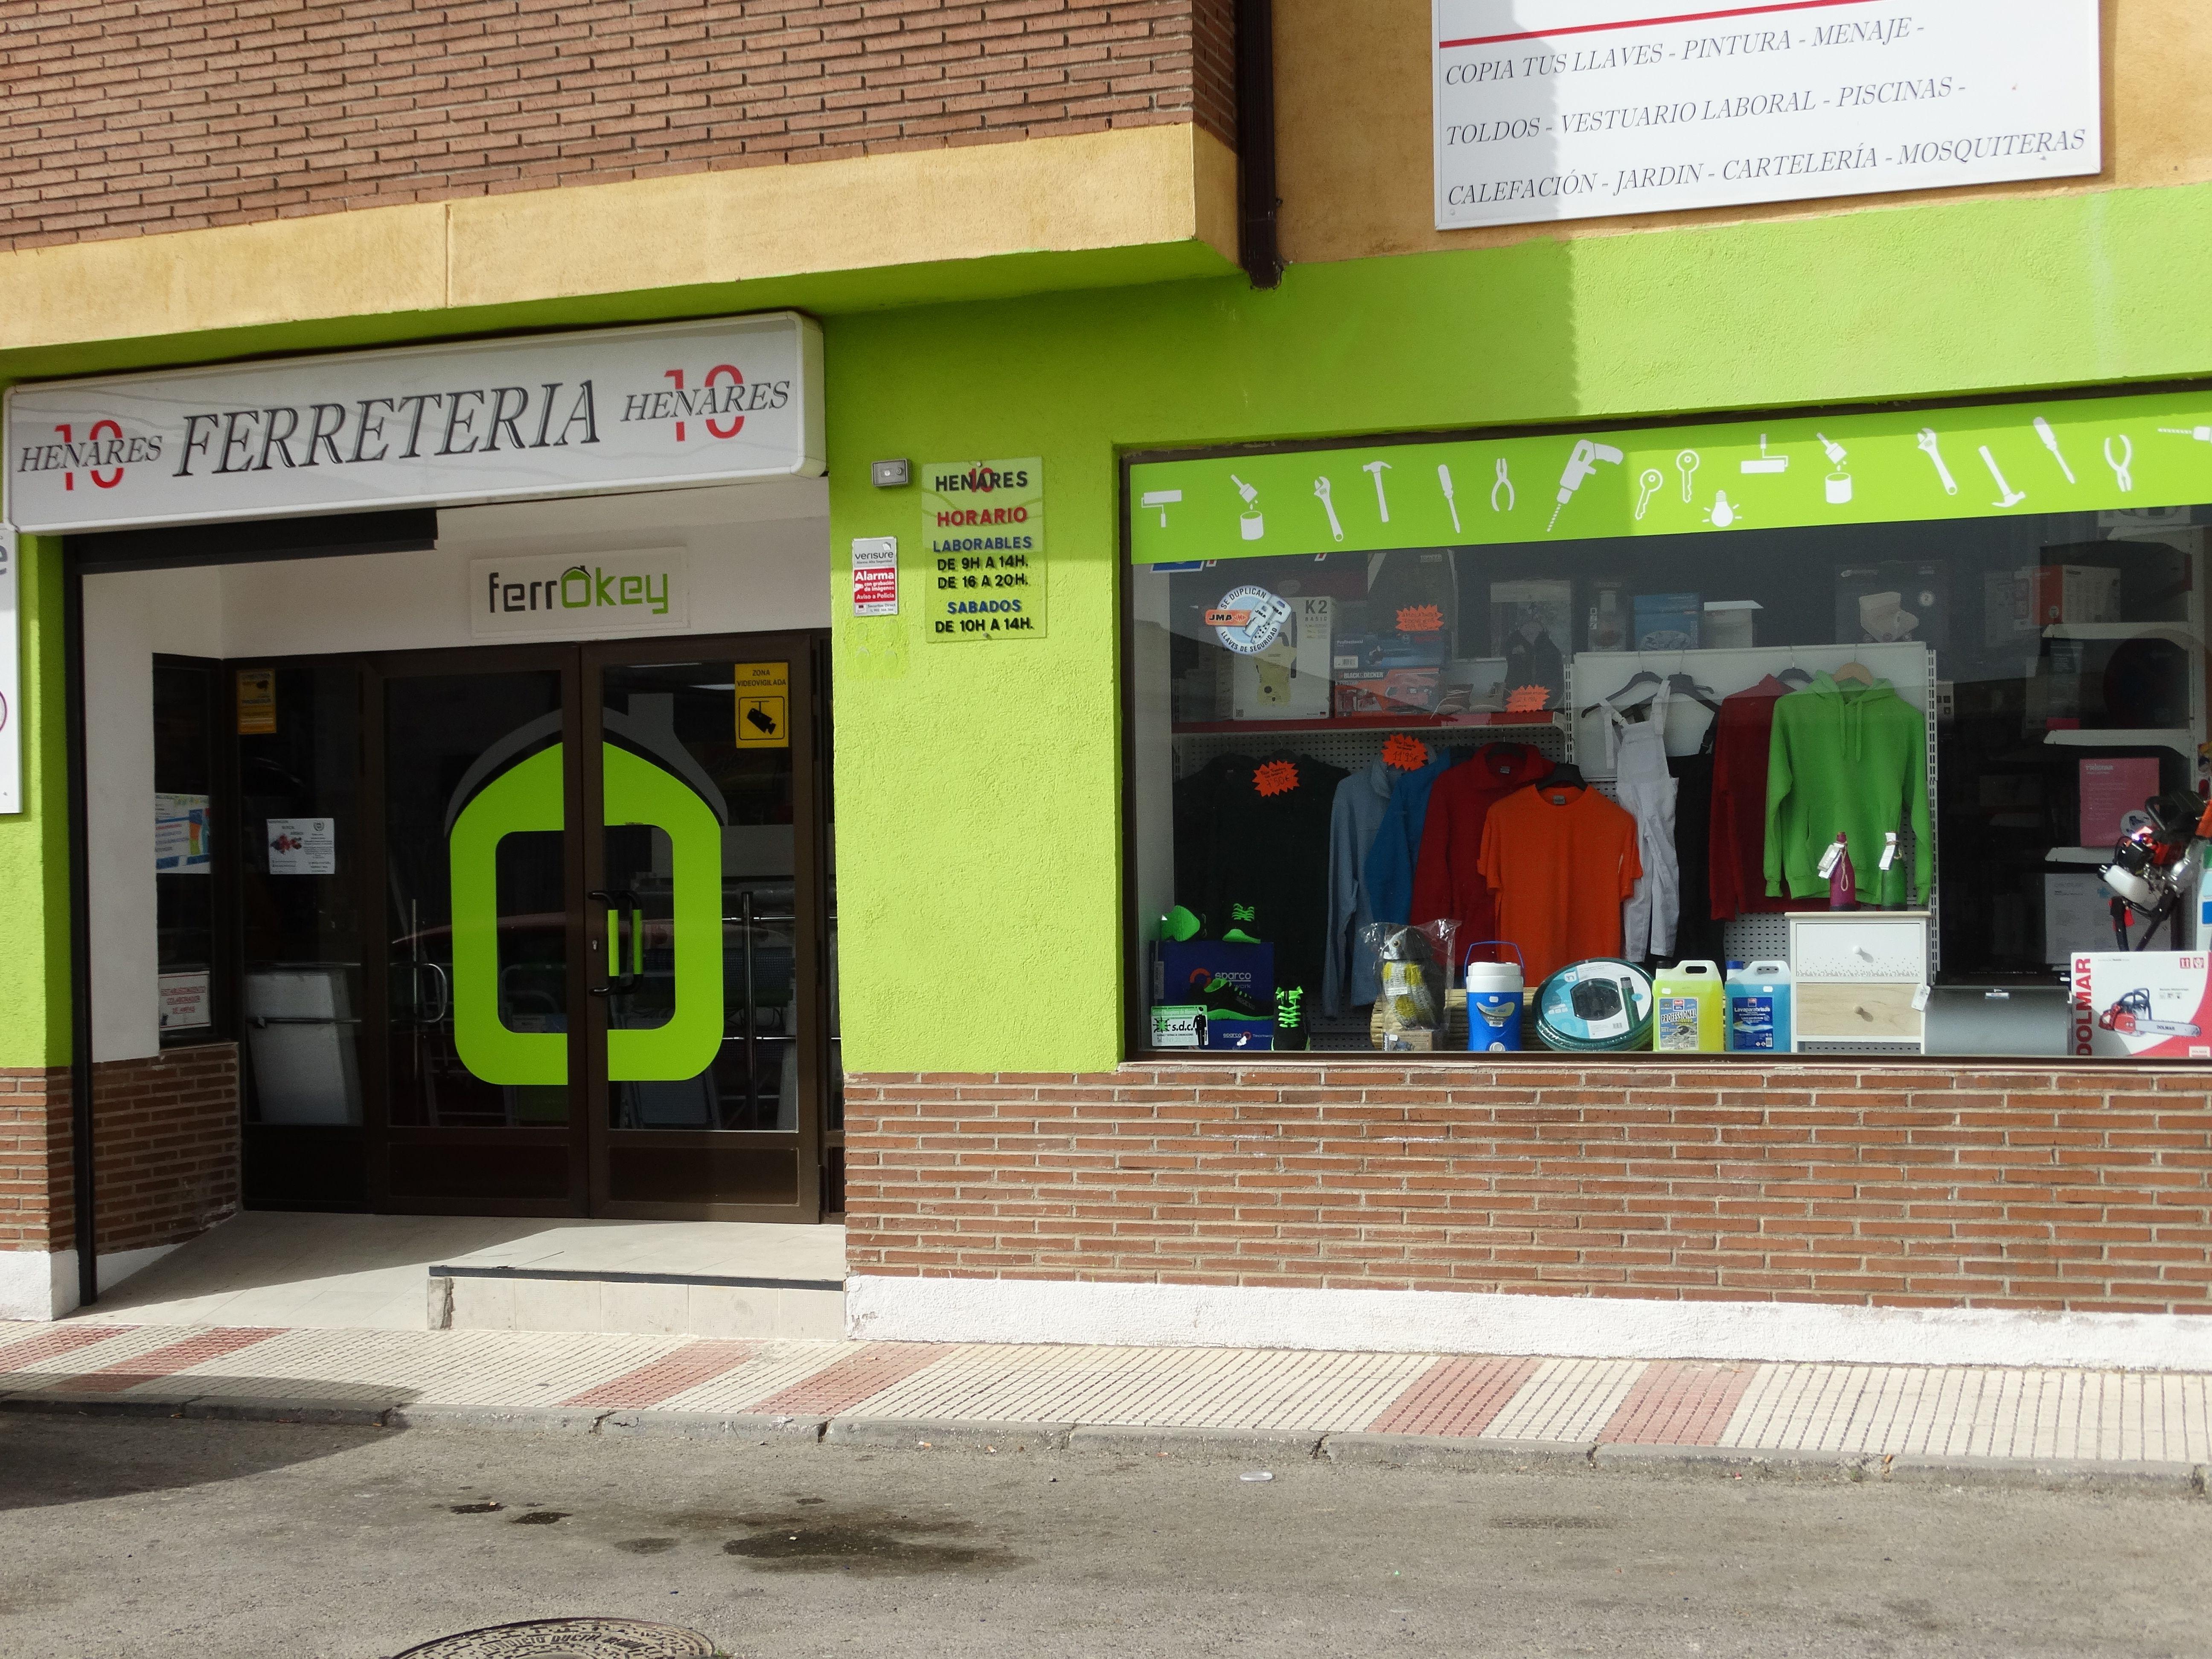 Ferretera industríal en Guadalajara